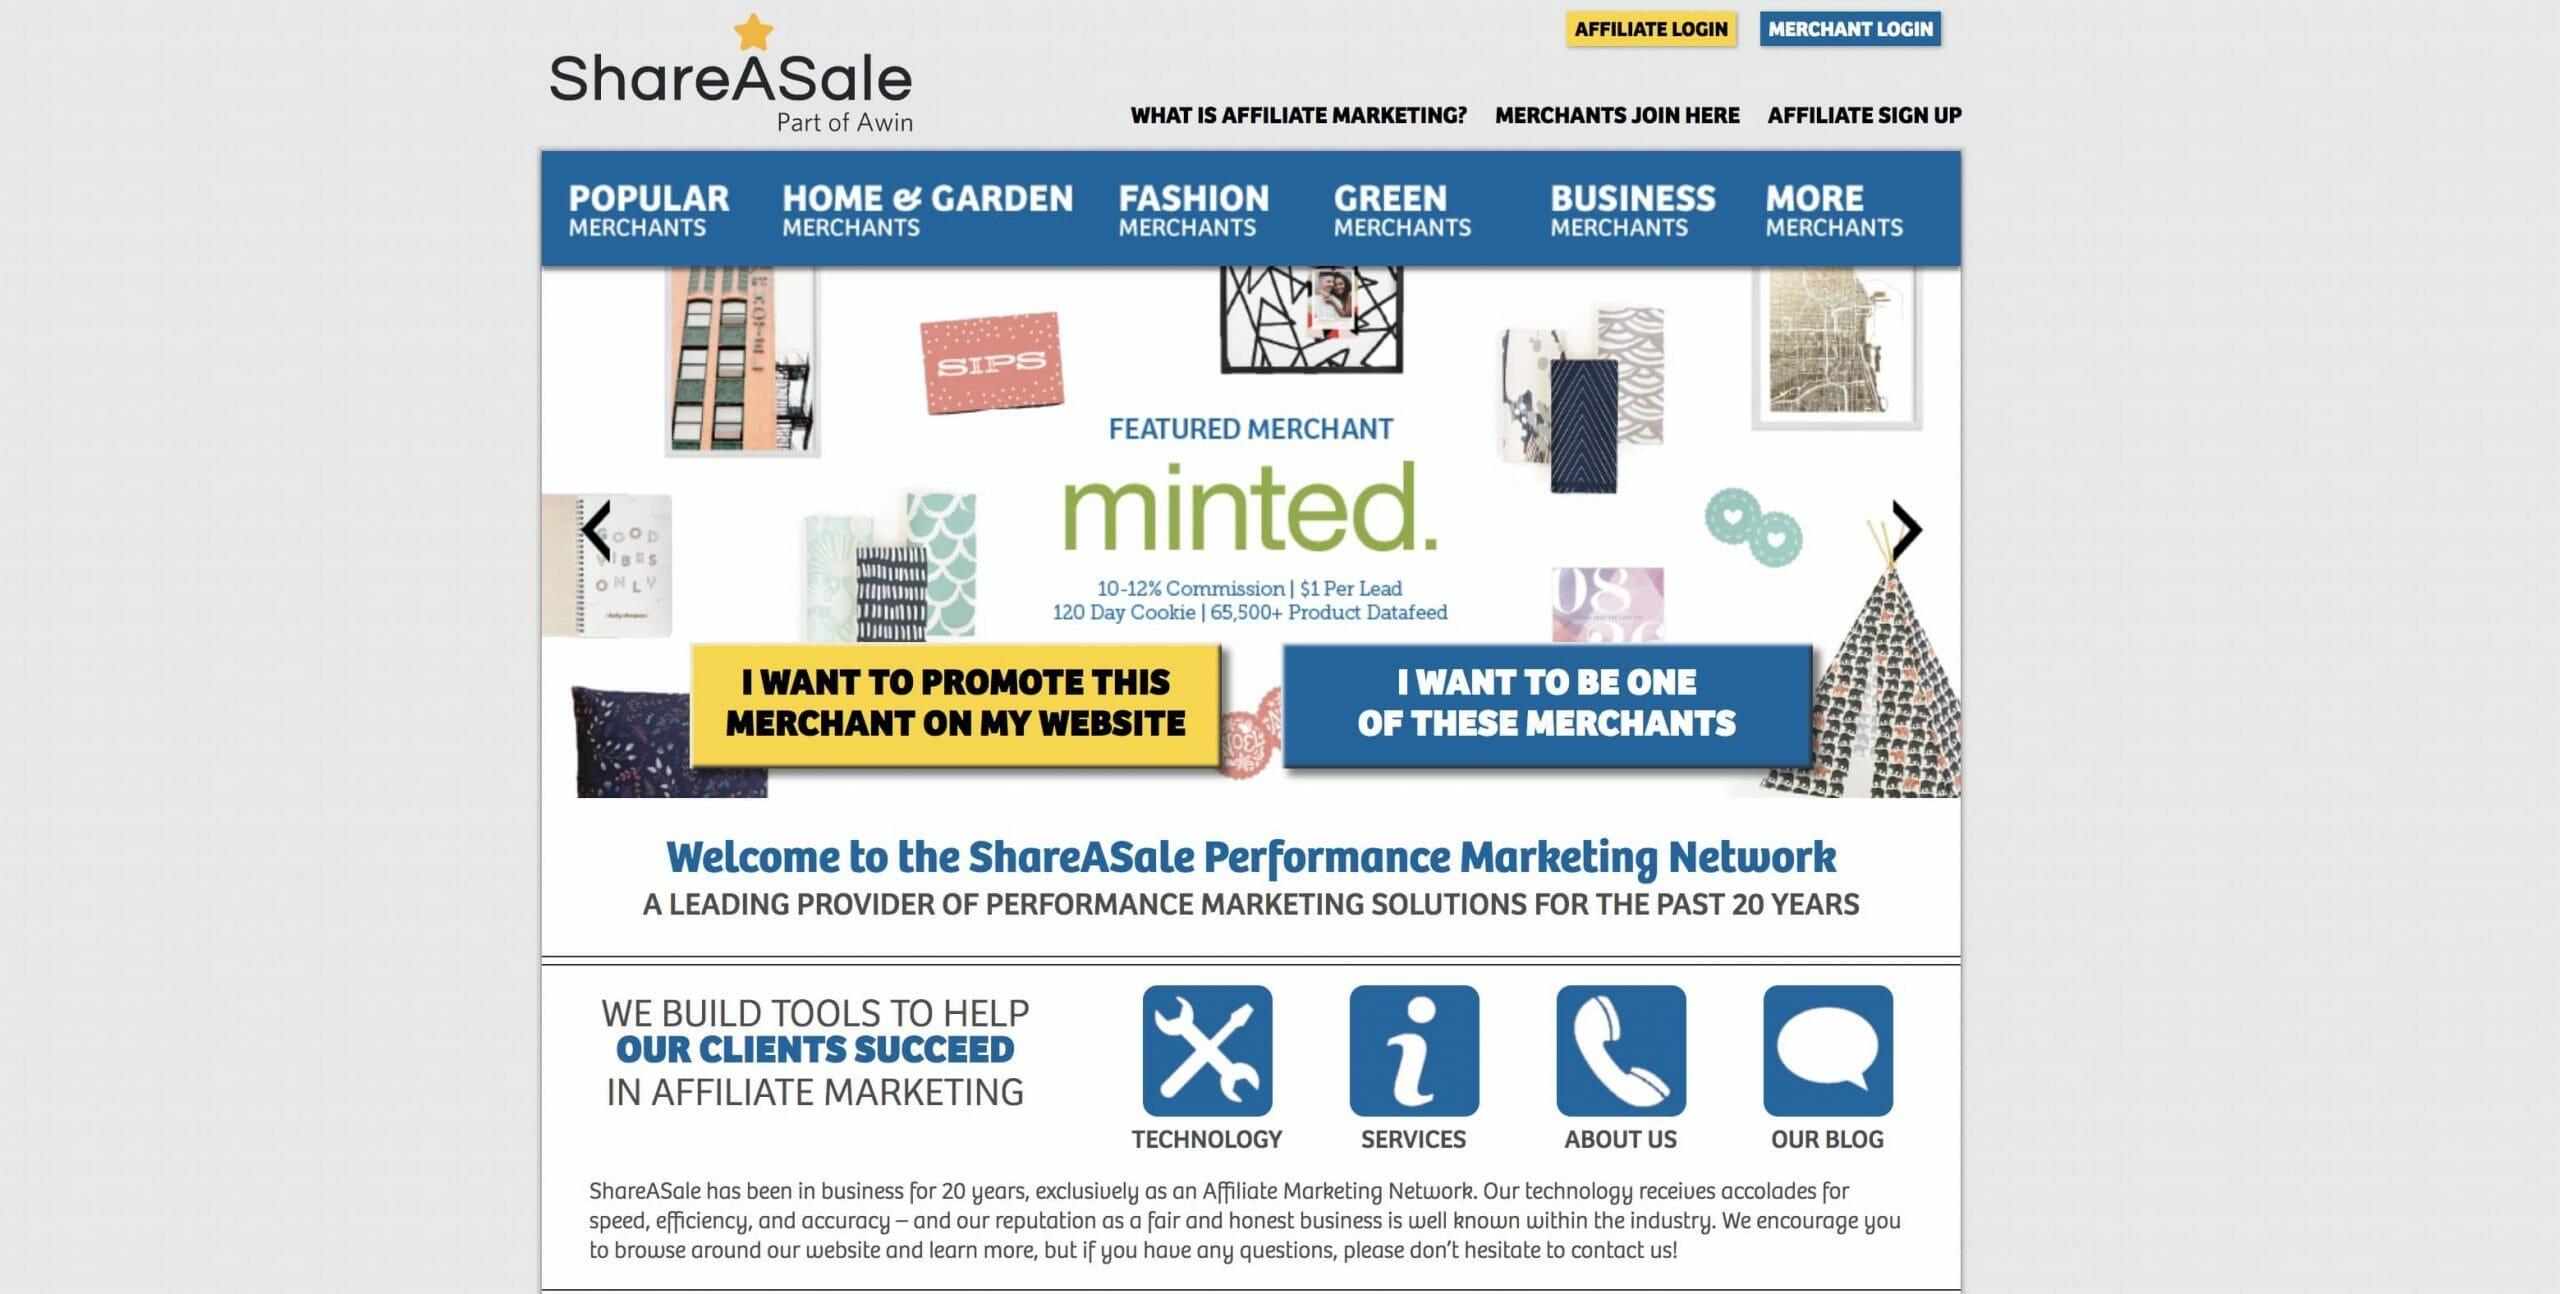 Shareasale Homepage Snapshot